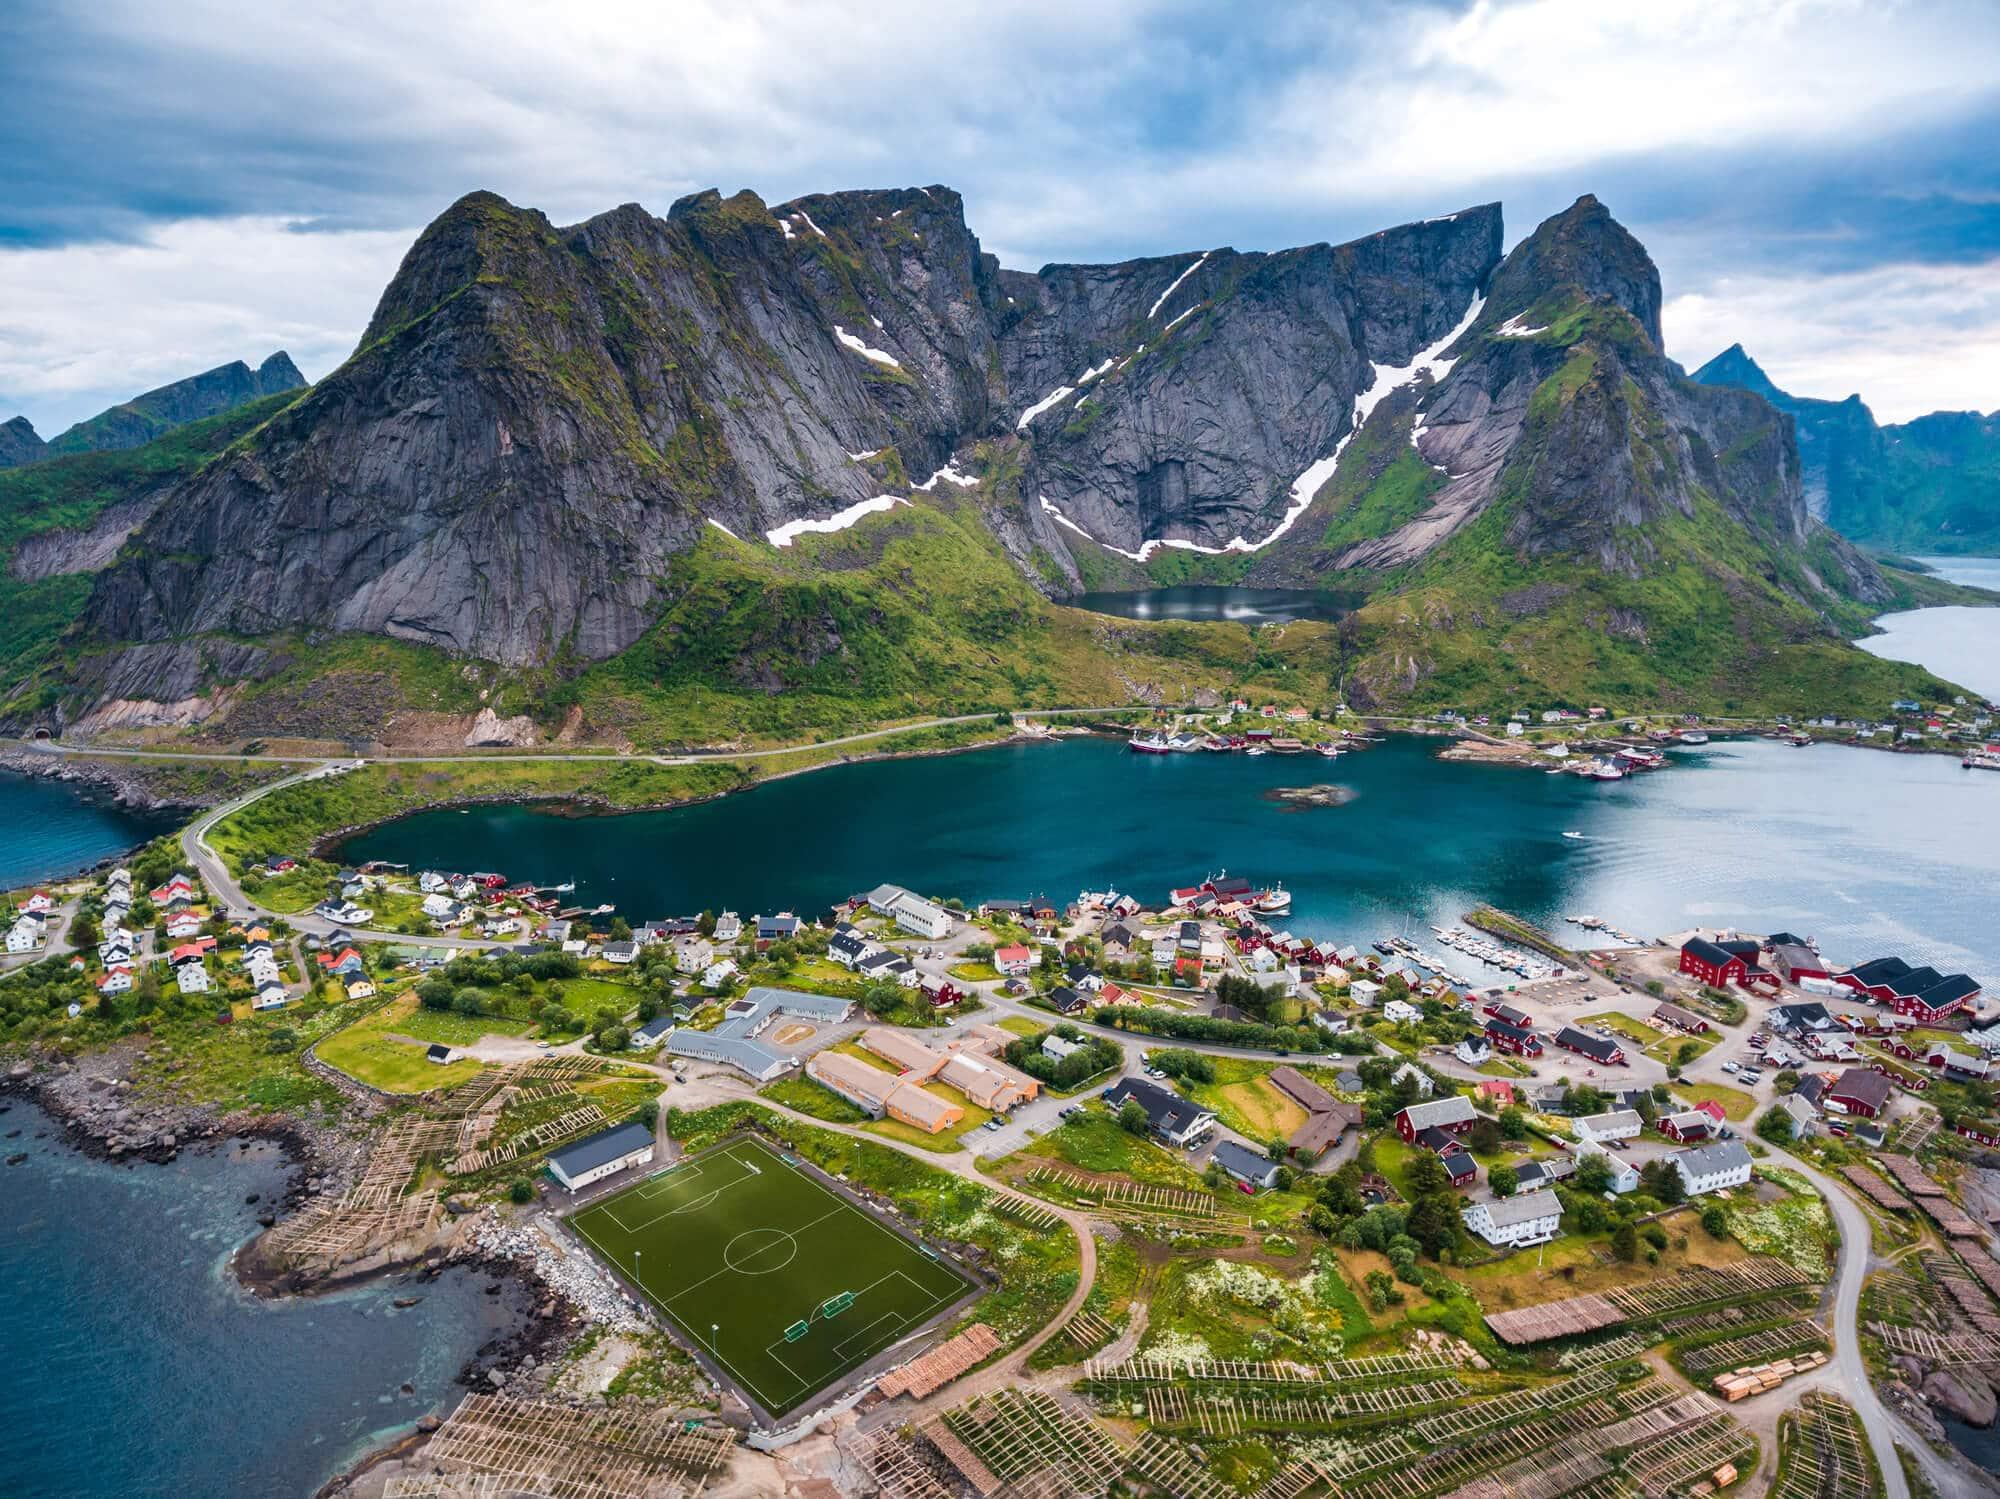 Top things to do in Norway - Reinebringen and soccer field in Reine, Lofoten